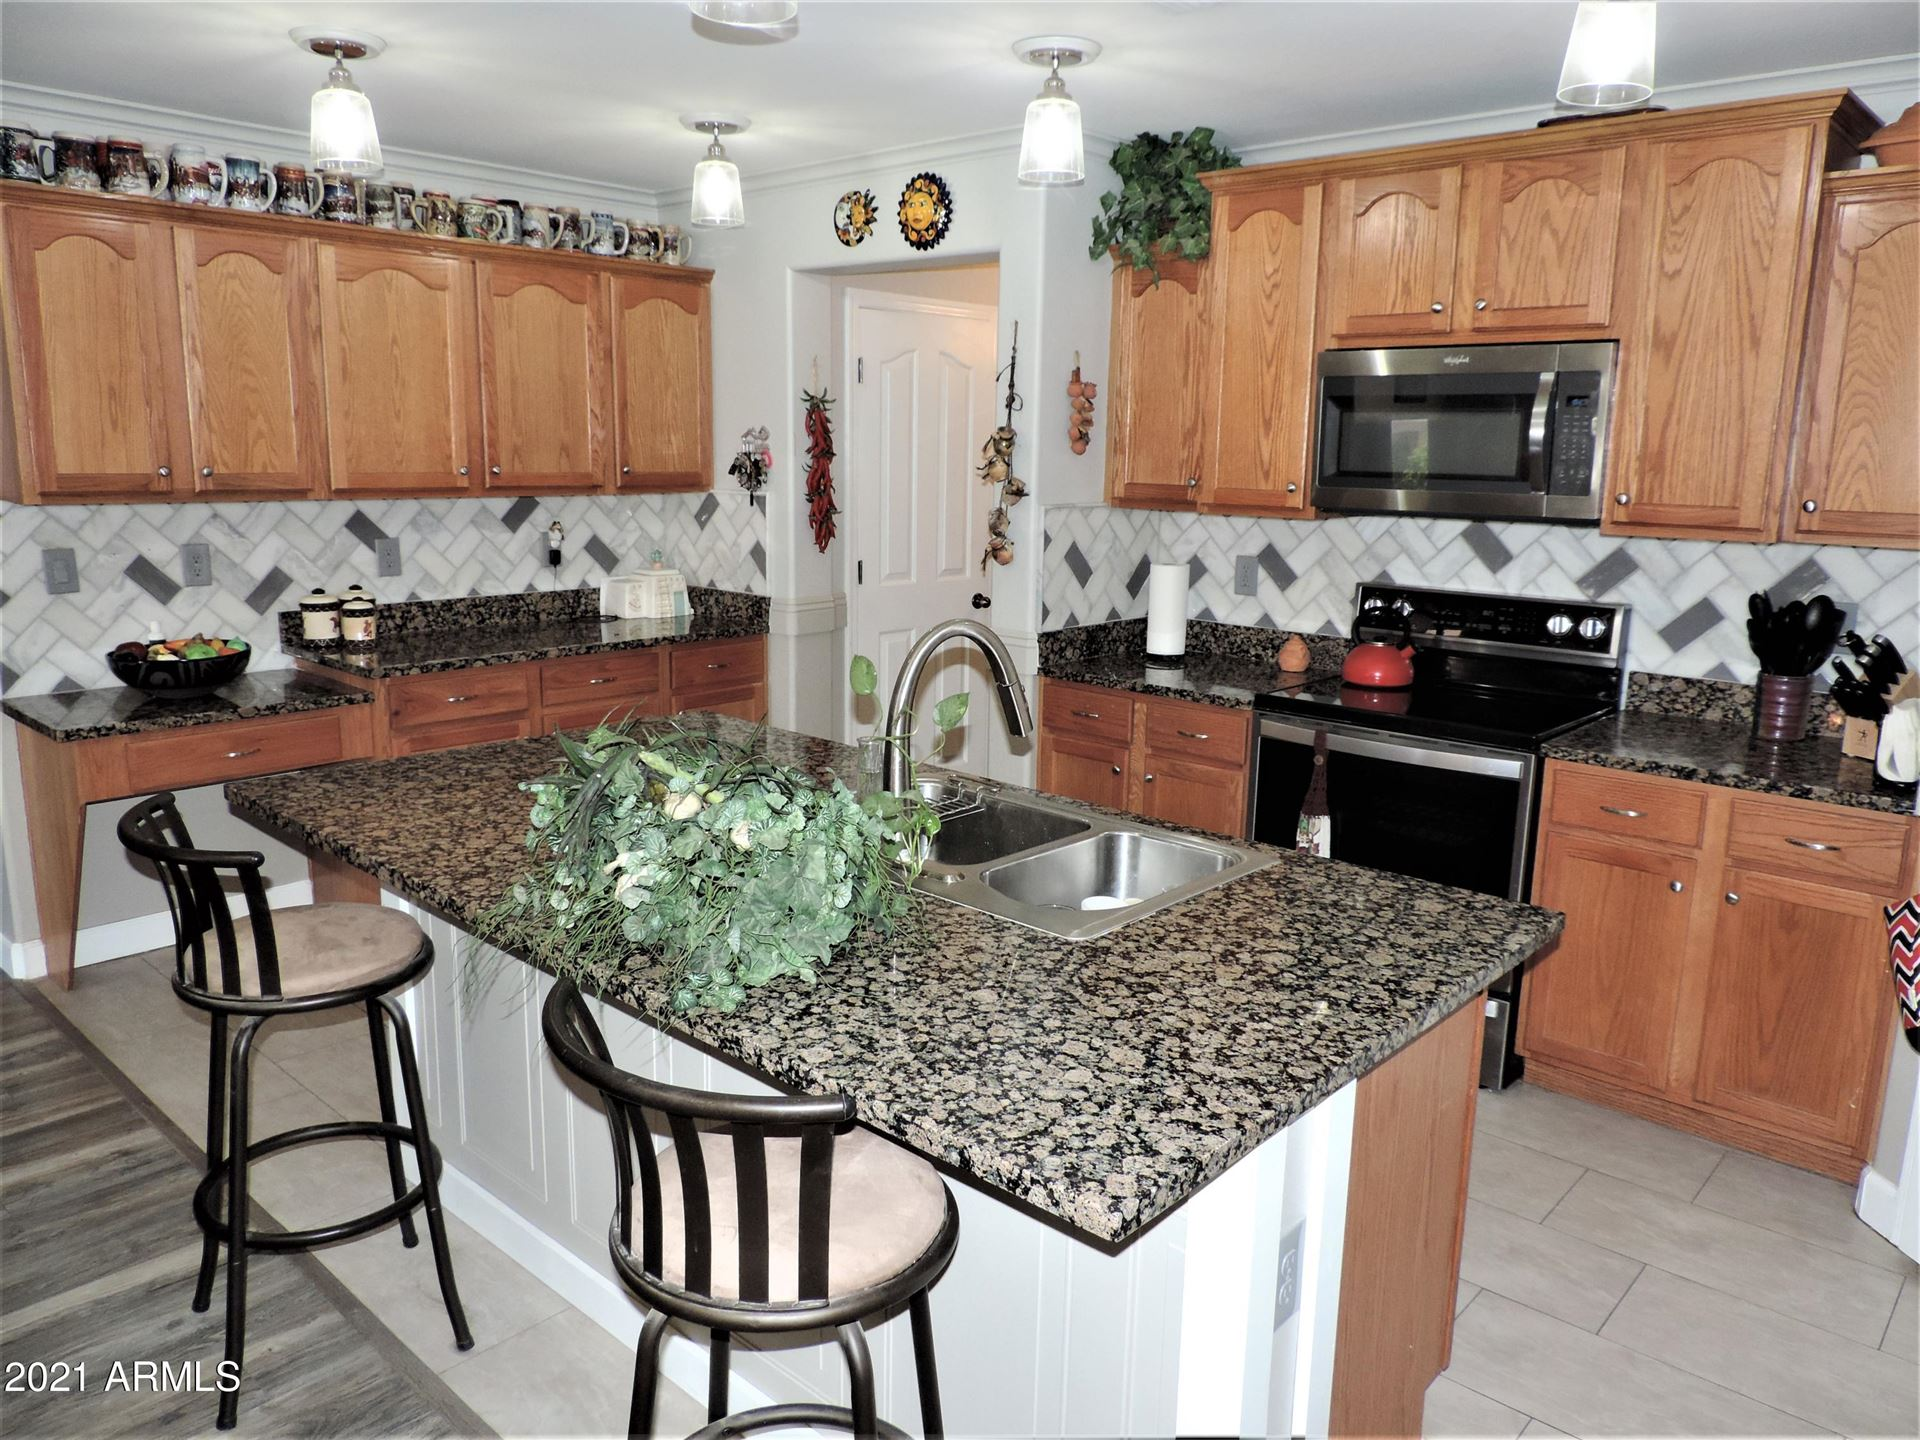 Photo of 928 W DESERT HILLS Drive, San Tan Valley, AZ 85143 (MLS # 6293364)